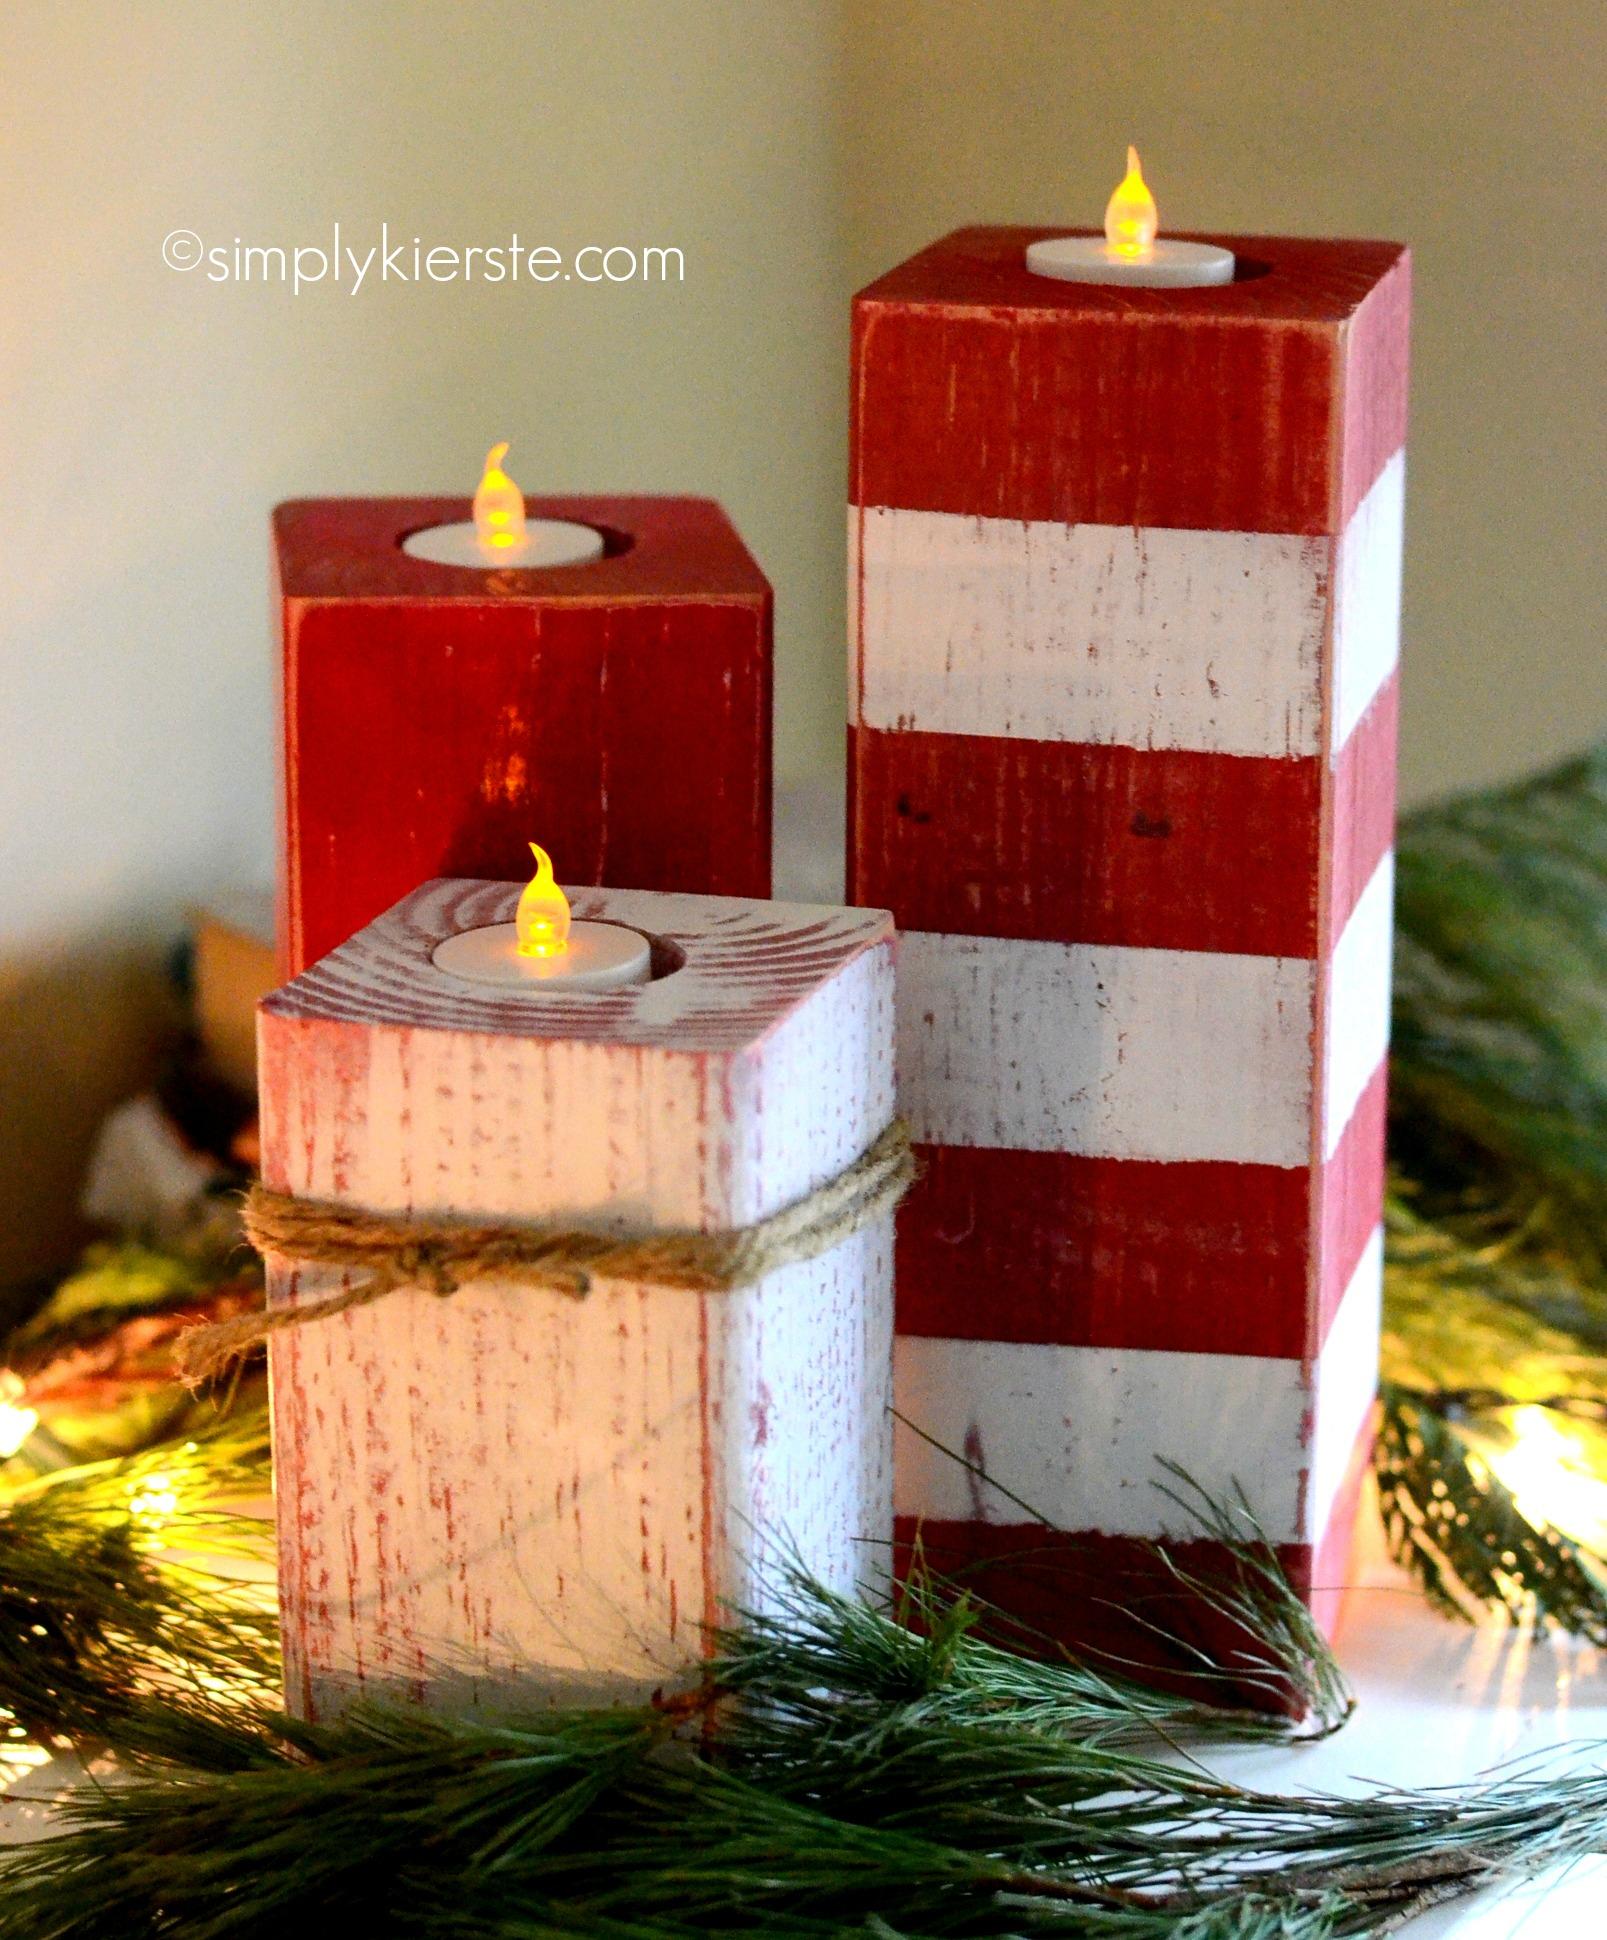 4x4 Wood Crafts Peppermint Striped Candlesticks Simplykierstecom